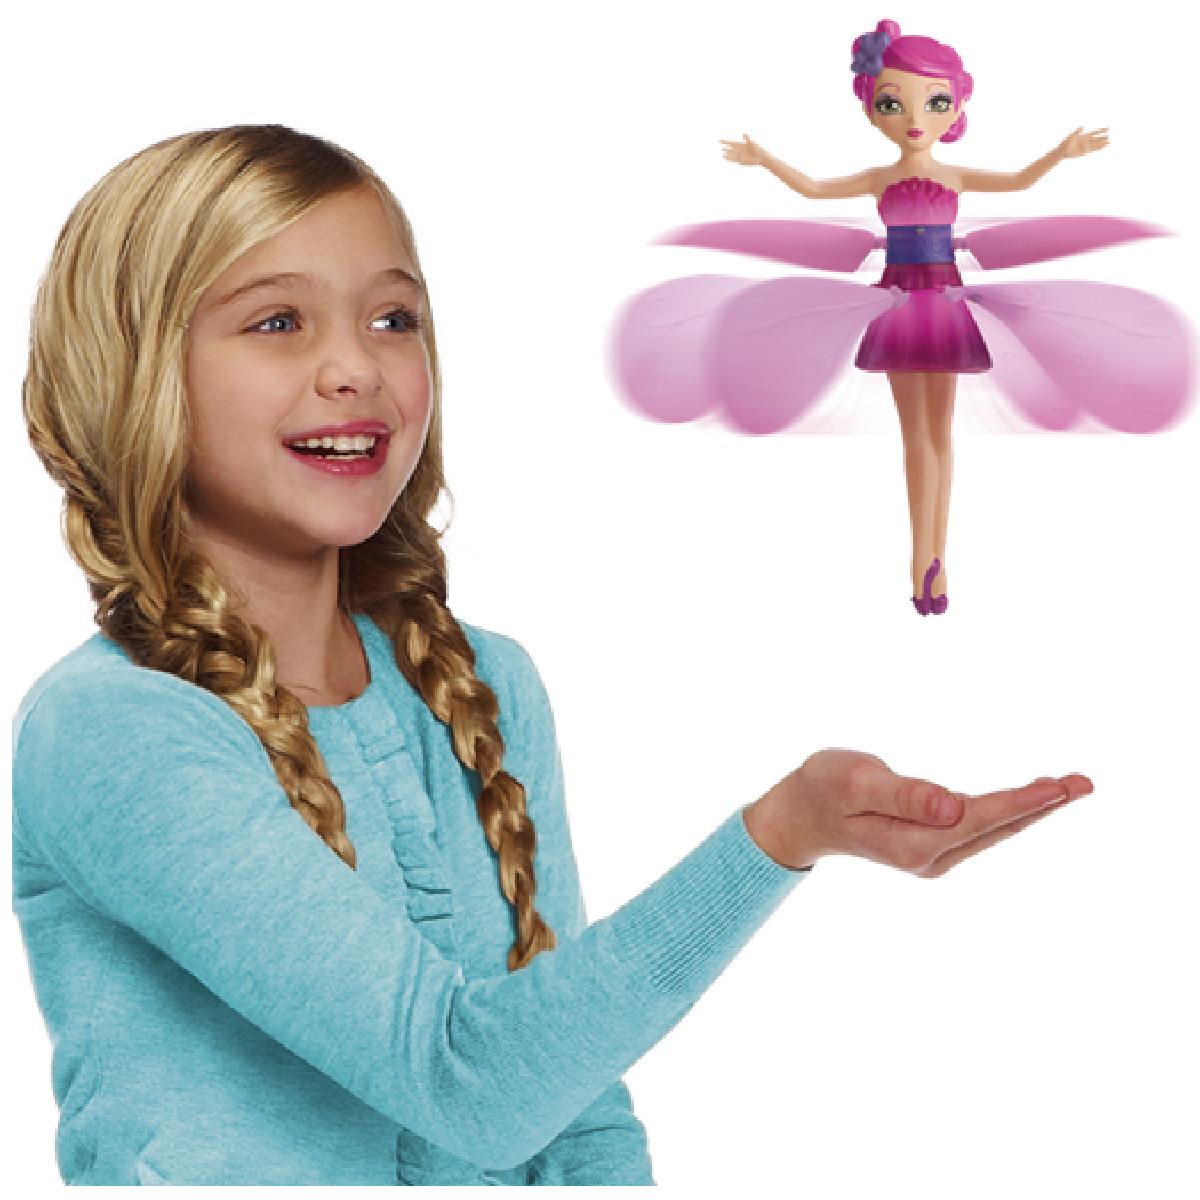 Летающая кукла фея Flying Fairy Интерактивная игрушка-кукла без подставки!